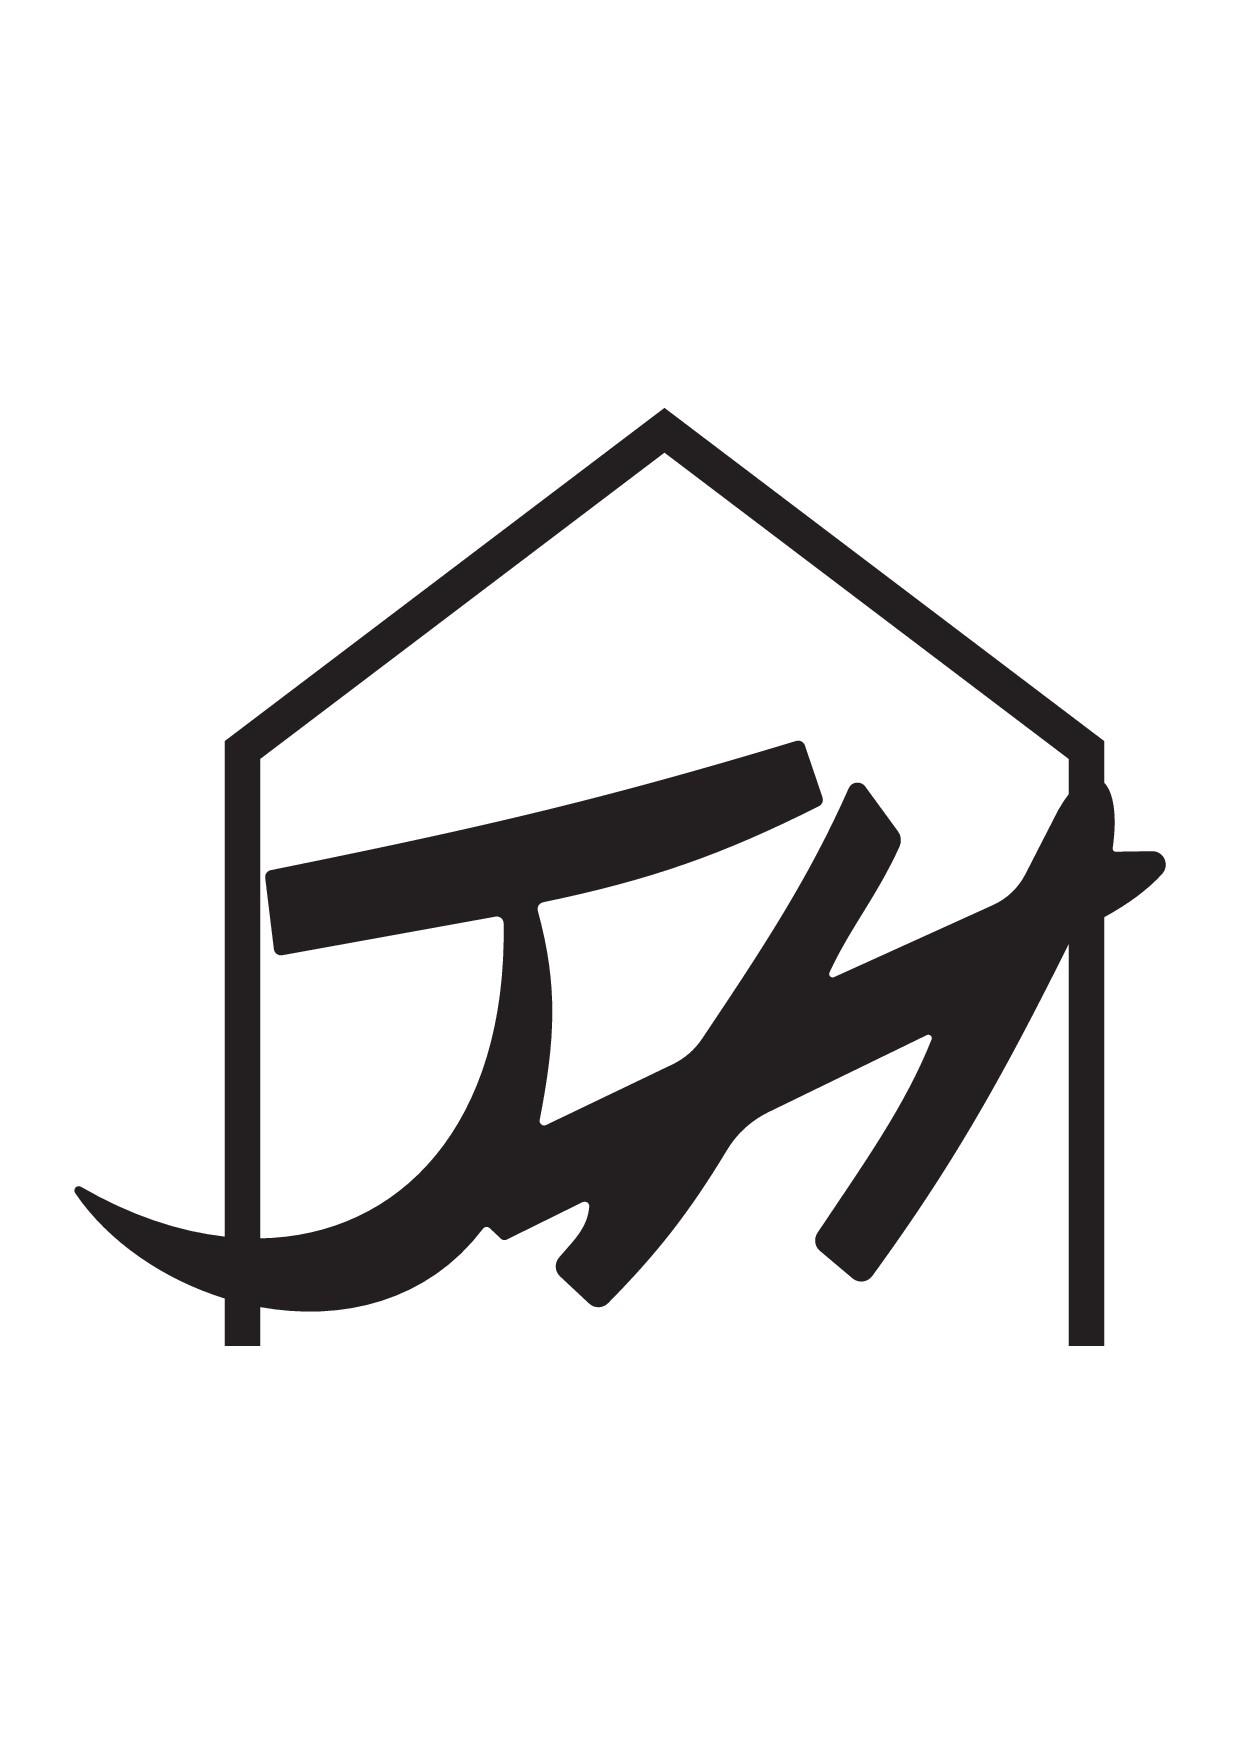 JH Constructions